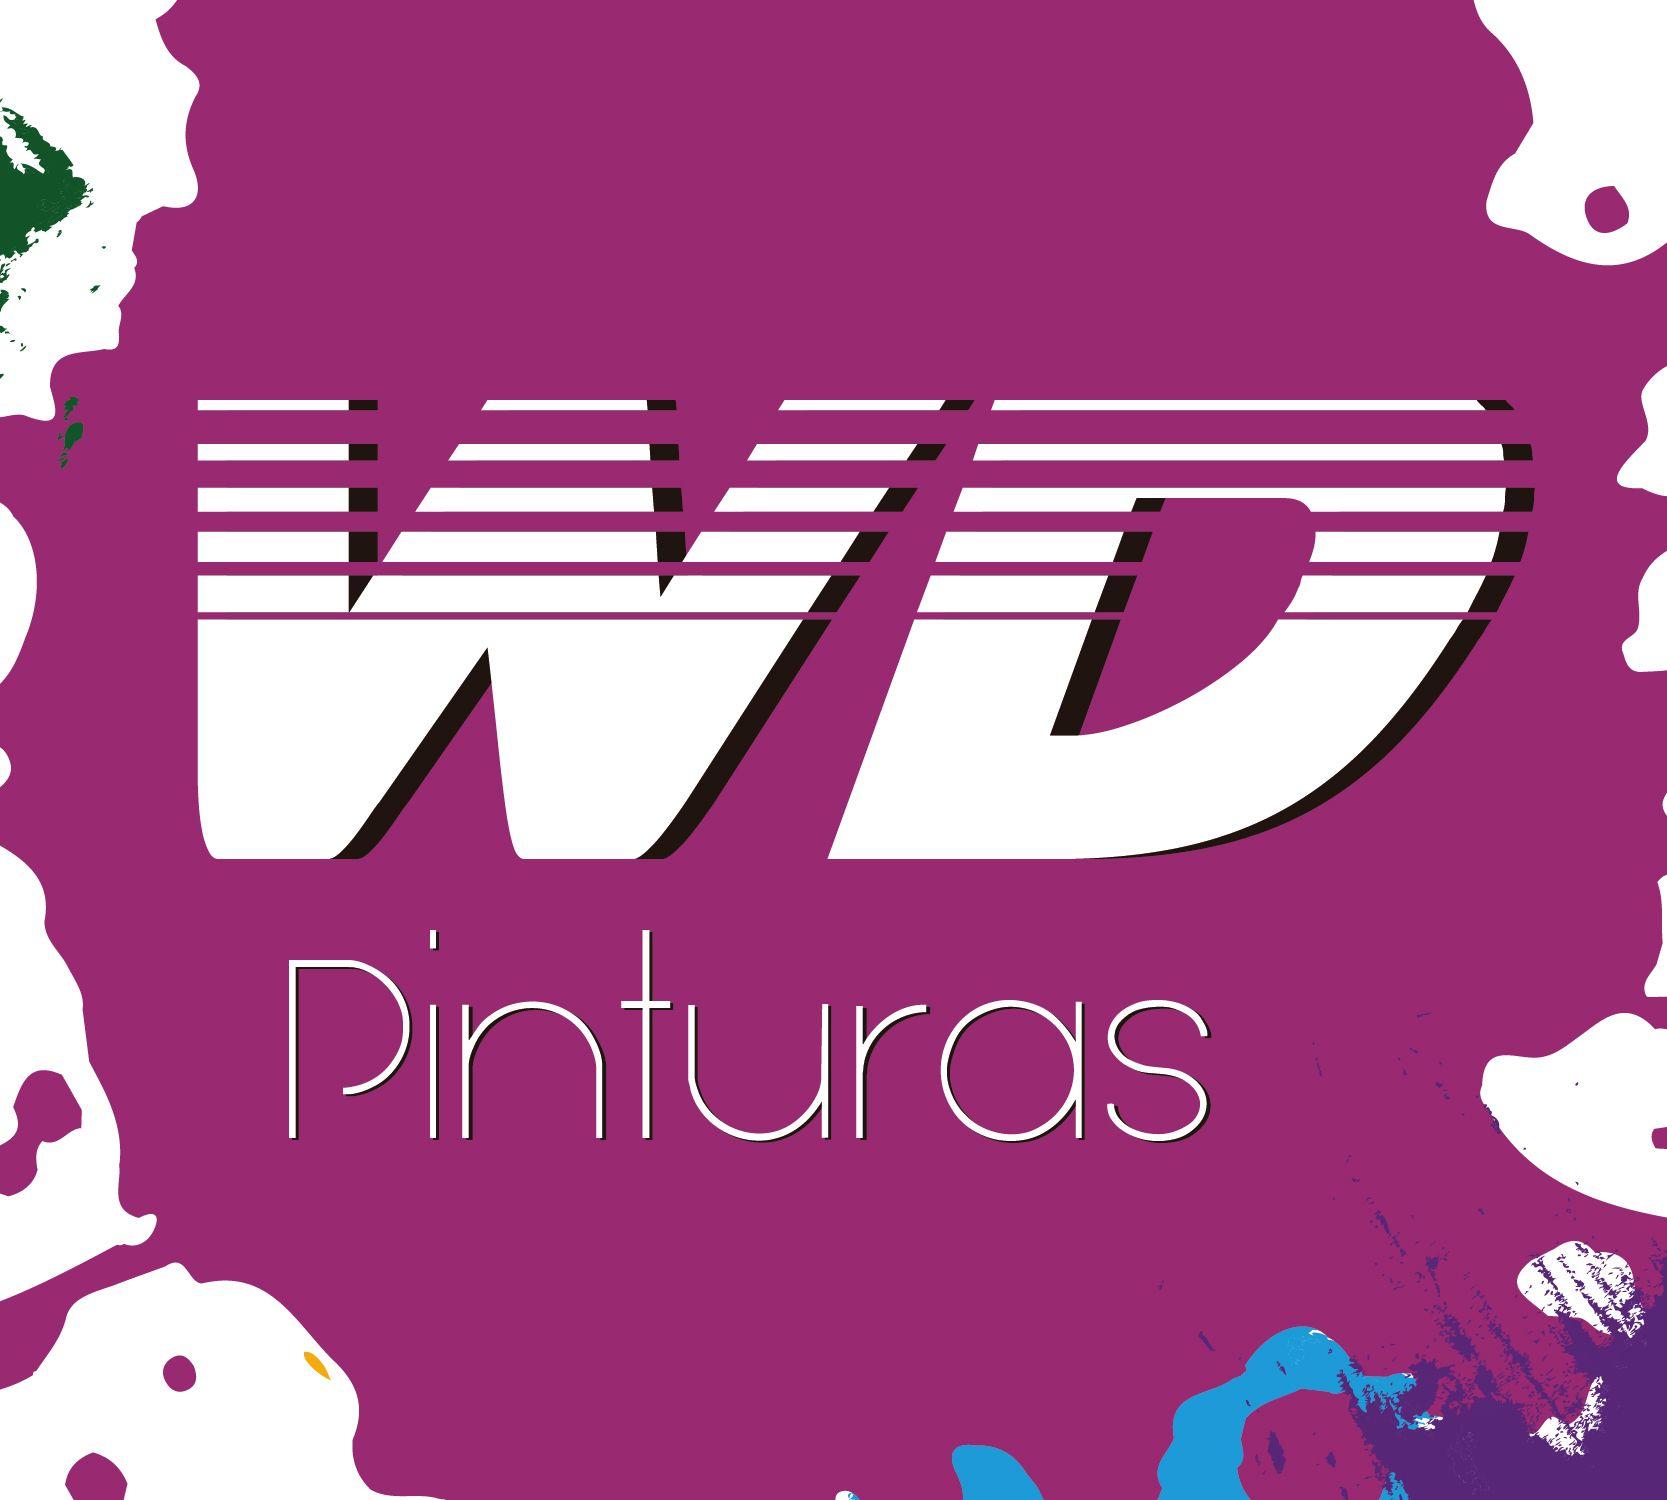 WD Pinturas - Welton em Guarujá